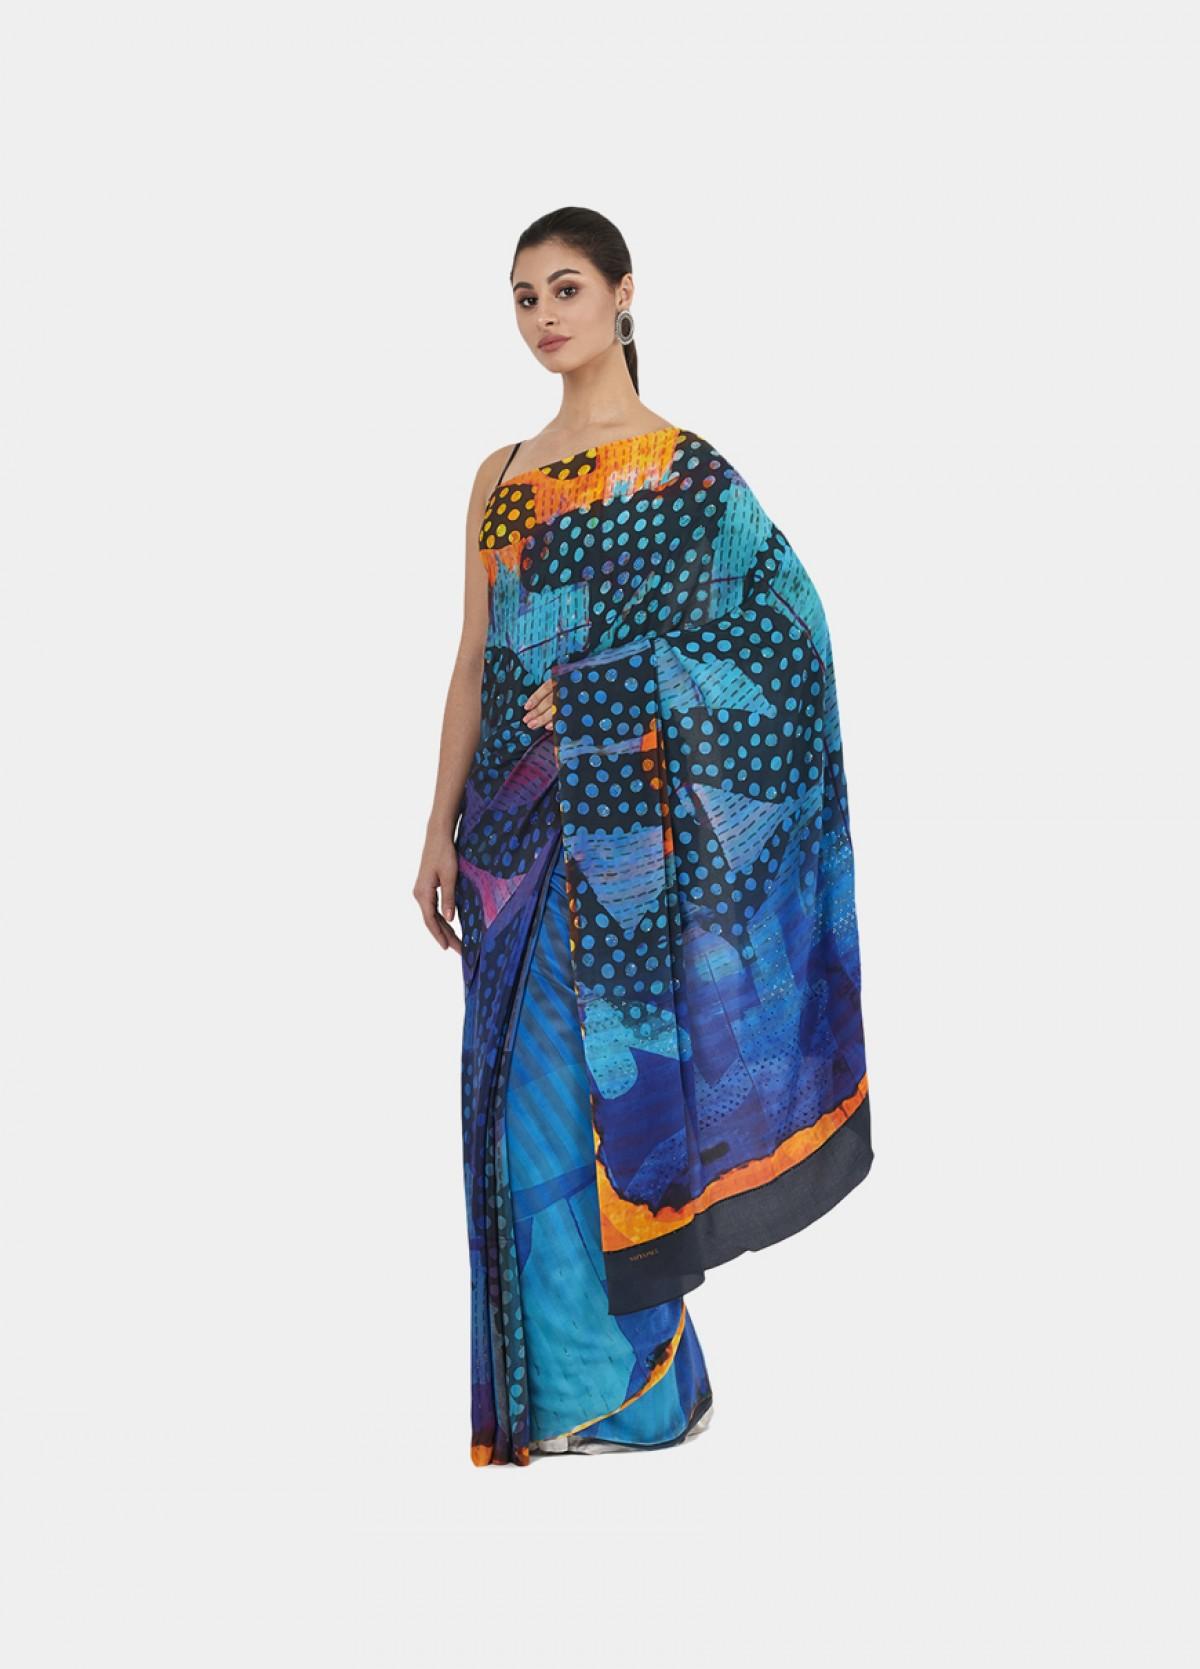 The Maze Sari